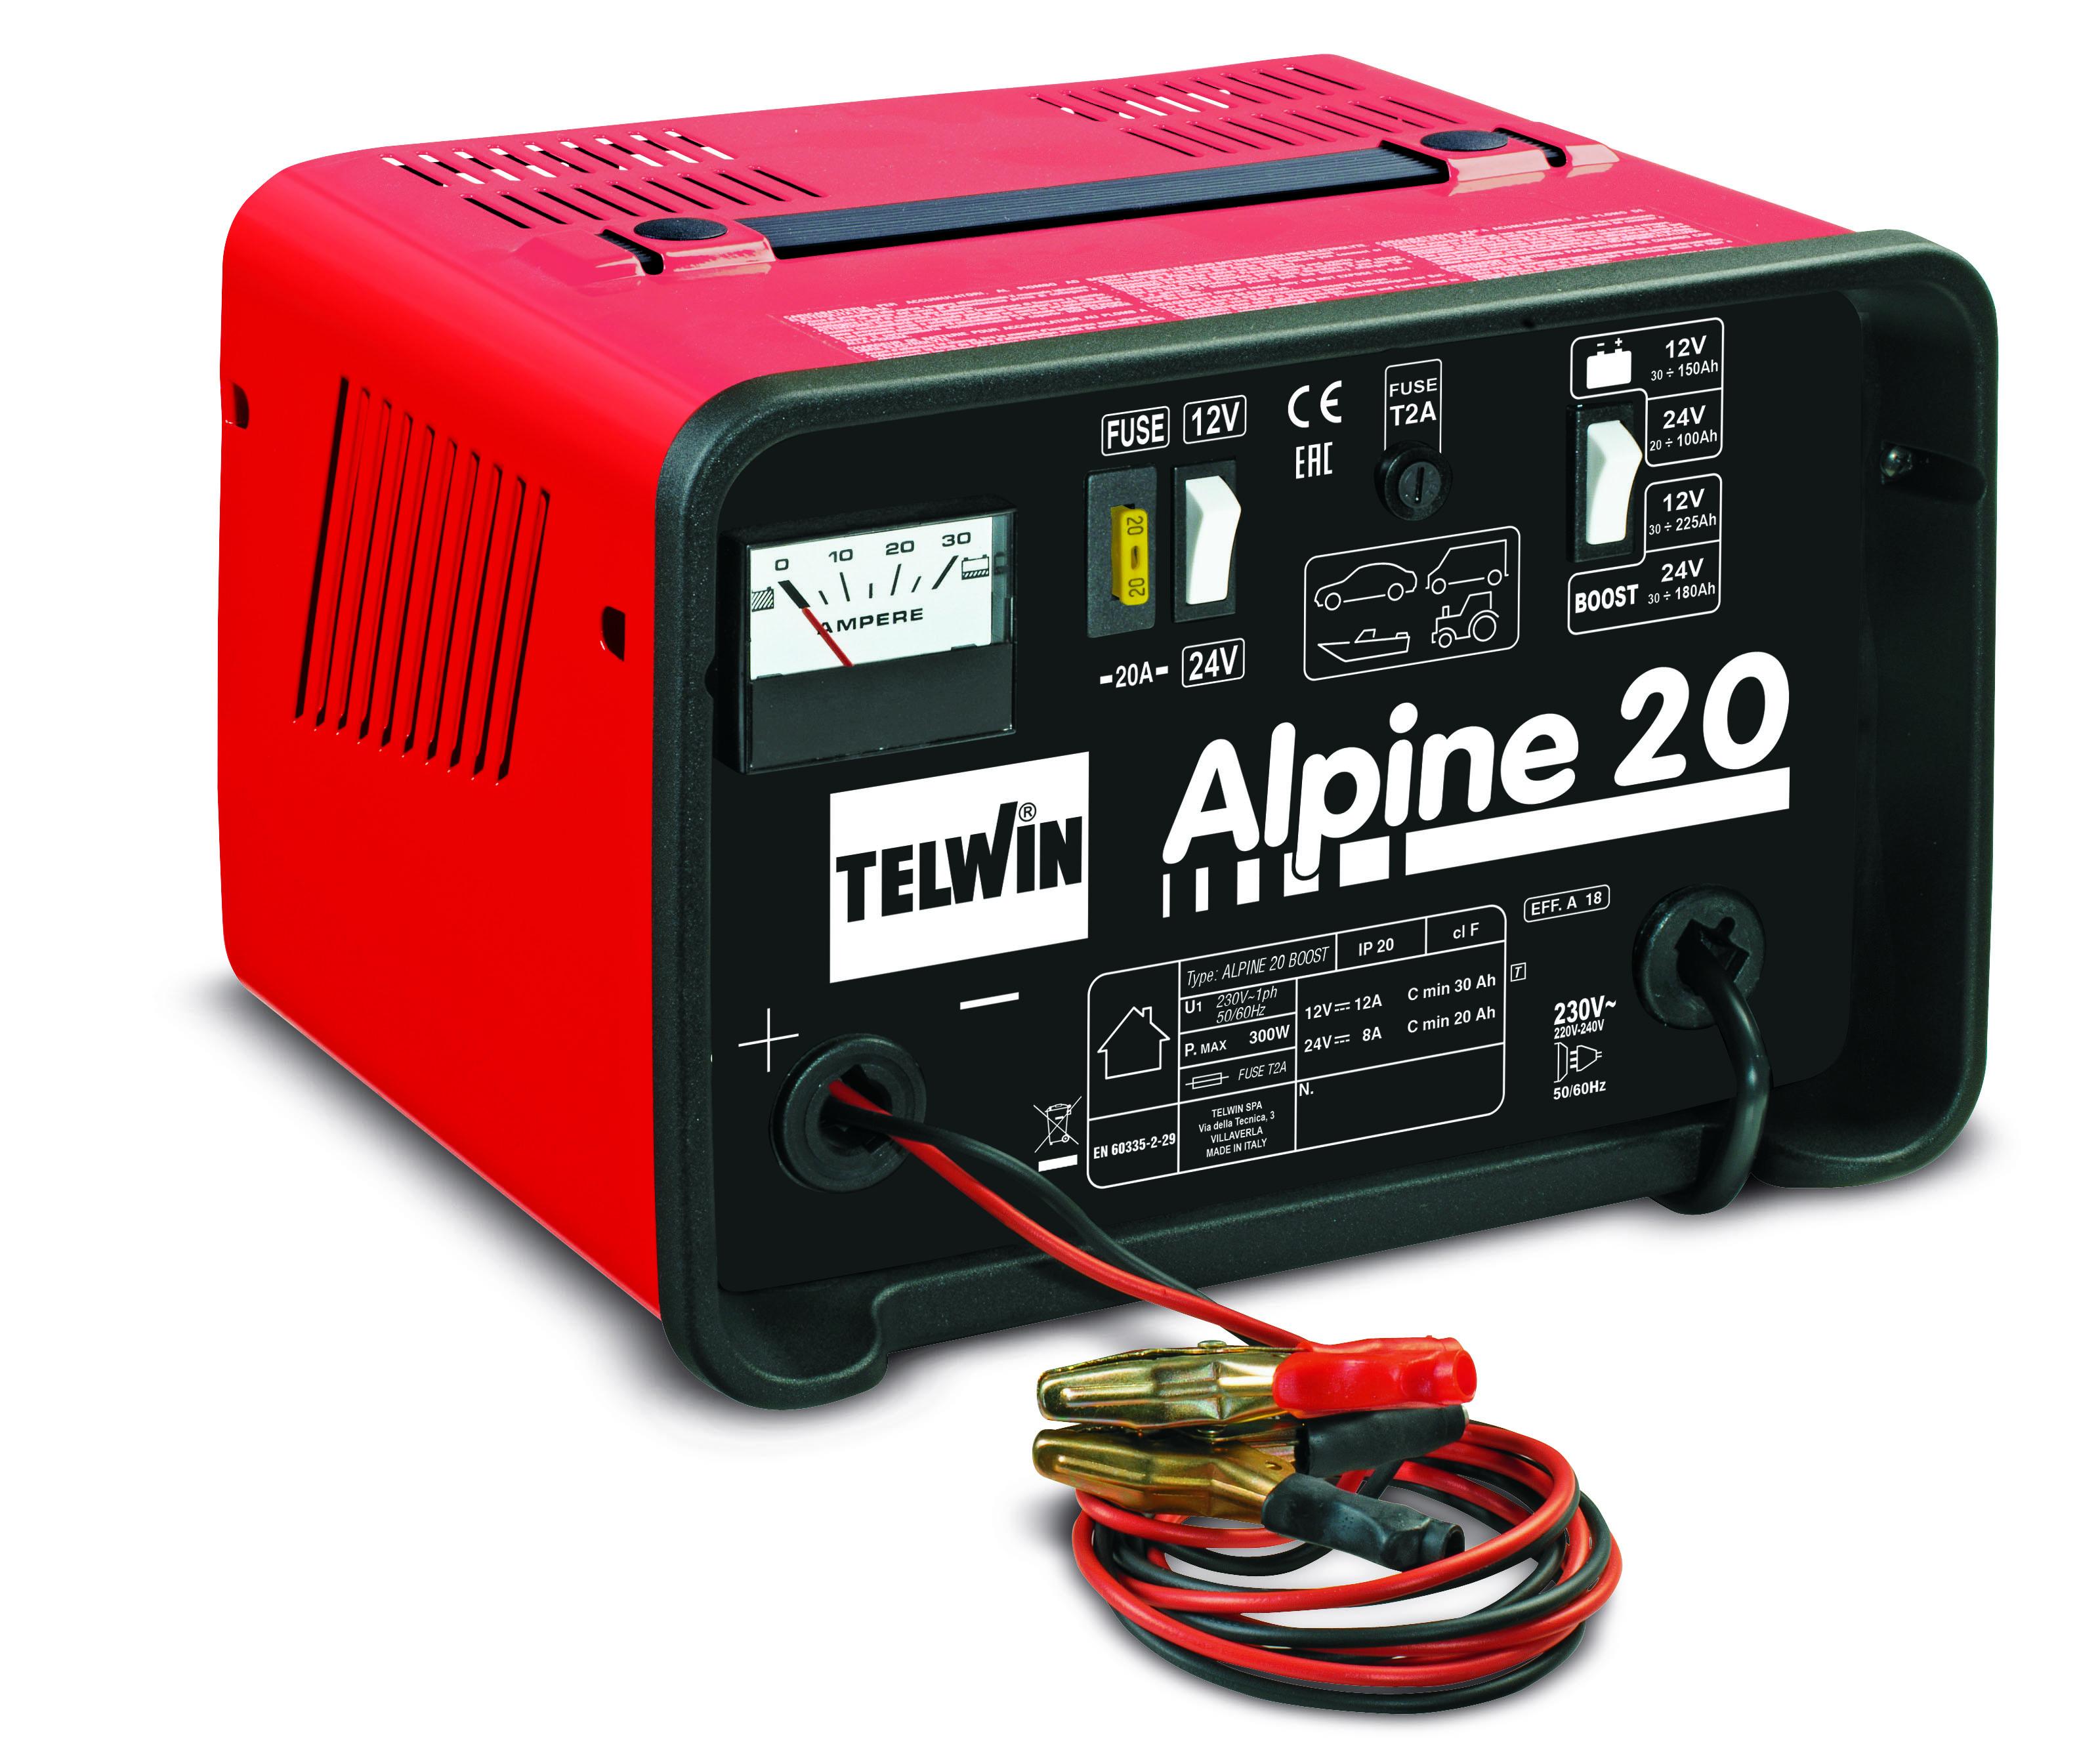 TELWIN 807546 - ALPINE 20 Boost Battery Charger, 230V 50/60HZ 12-24V